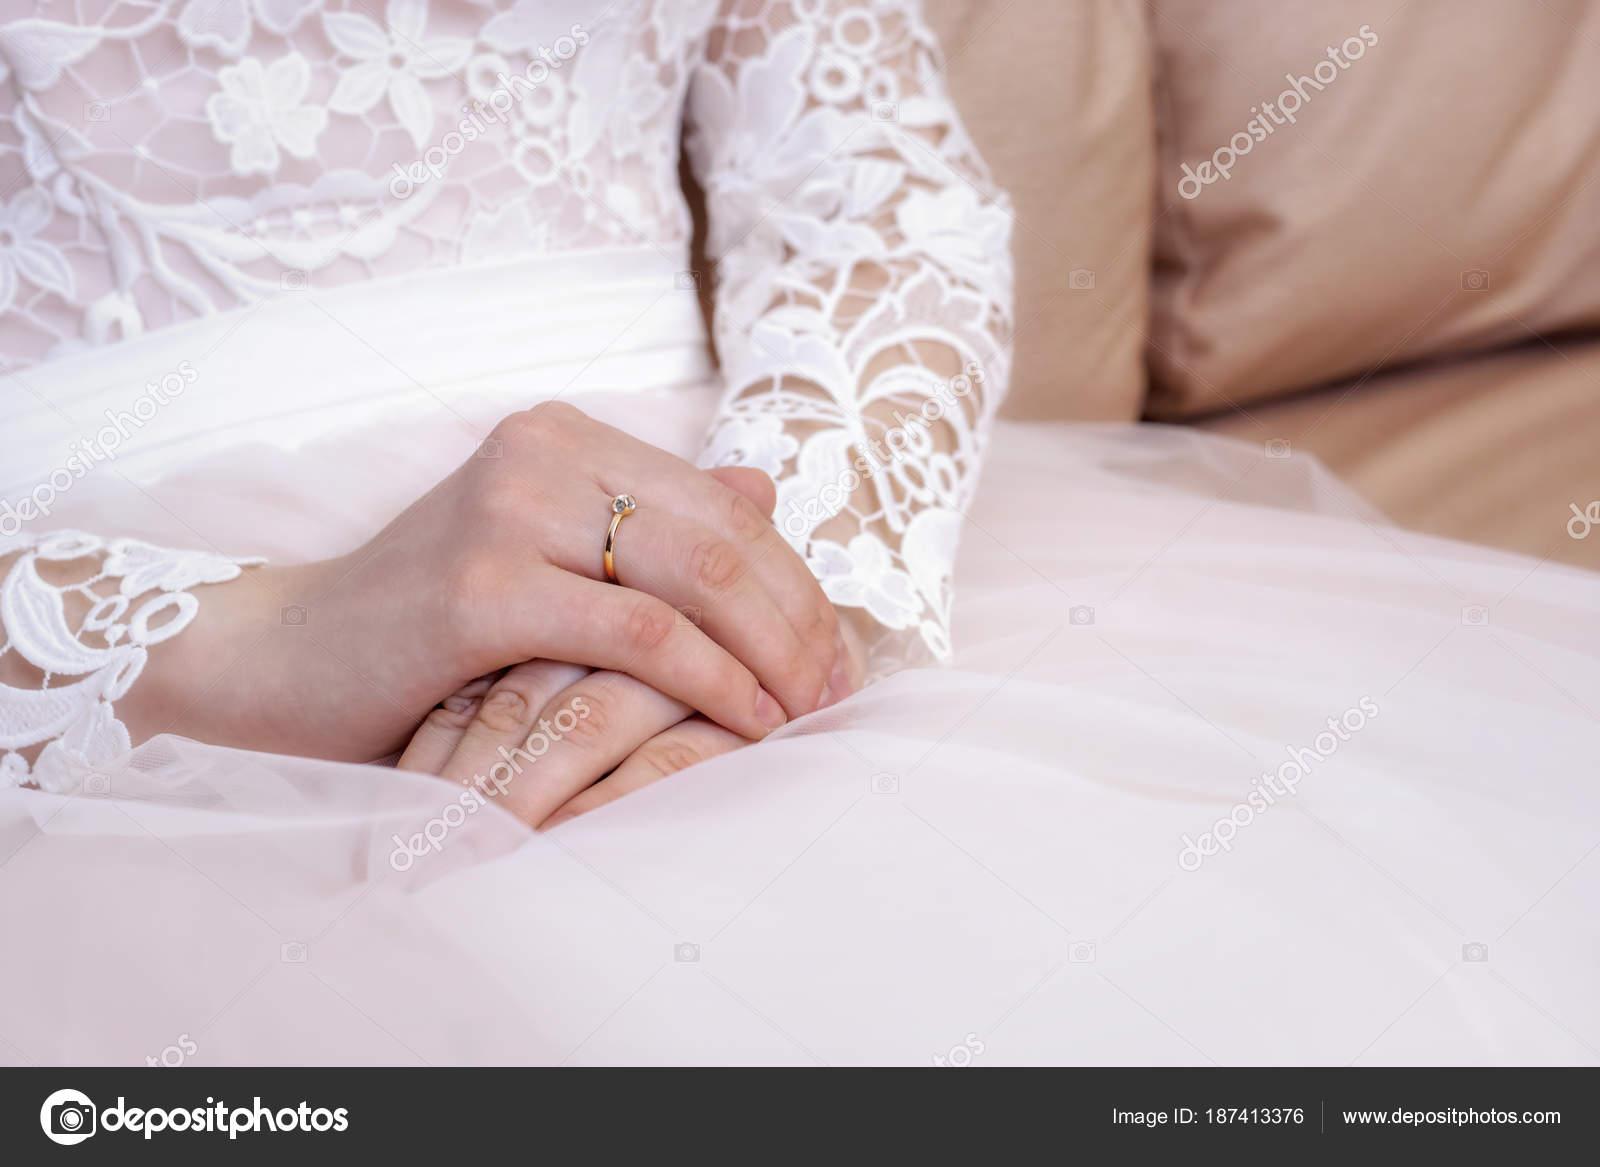 Vestido Manos Novia Boda Blanca Rosa — Foto de stock © sgorin #187413376